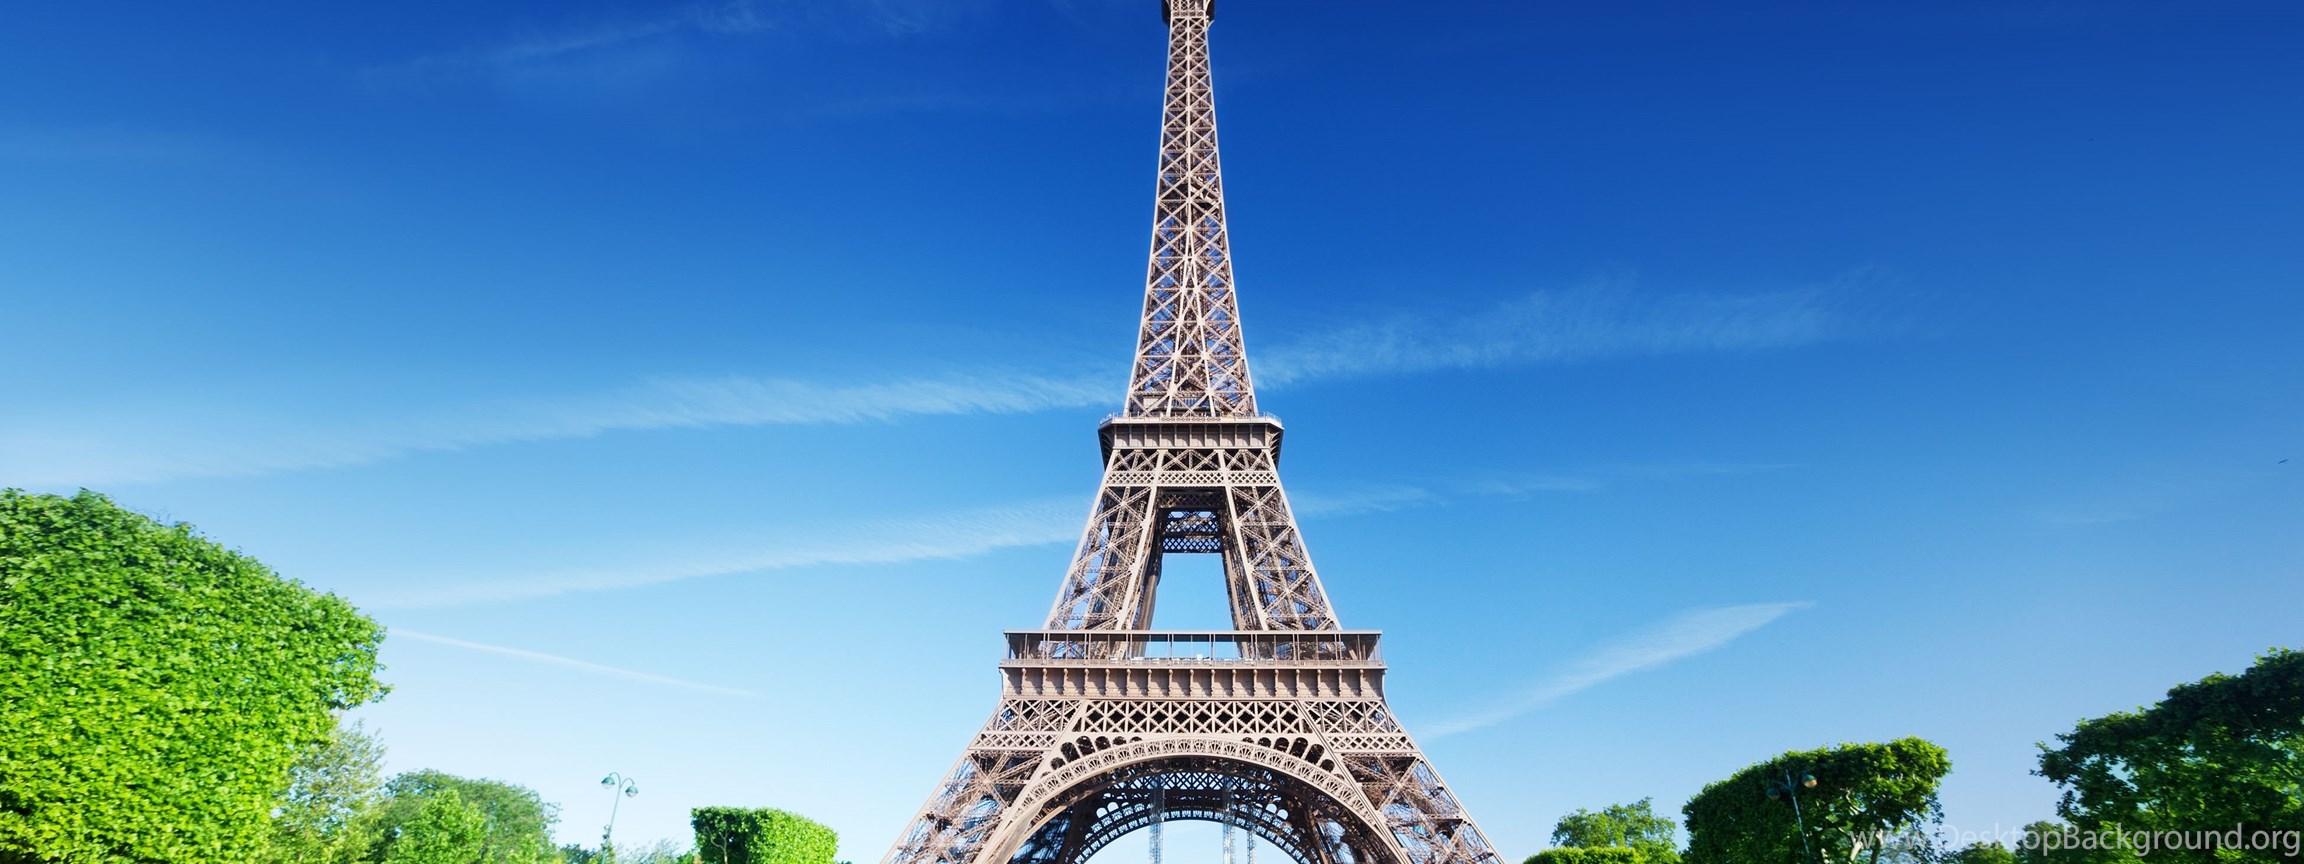 Cute Eiffel Tower Wallpaper: 1920x1080px Cute Tumblr Wallpapers Eiffel Tower Desktop